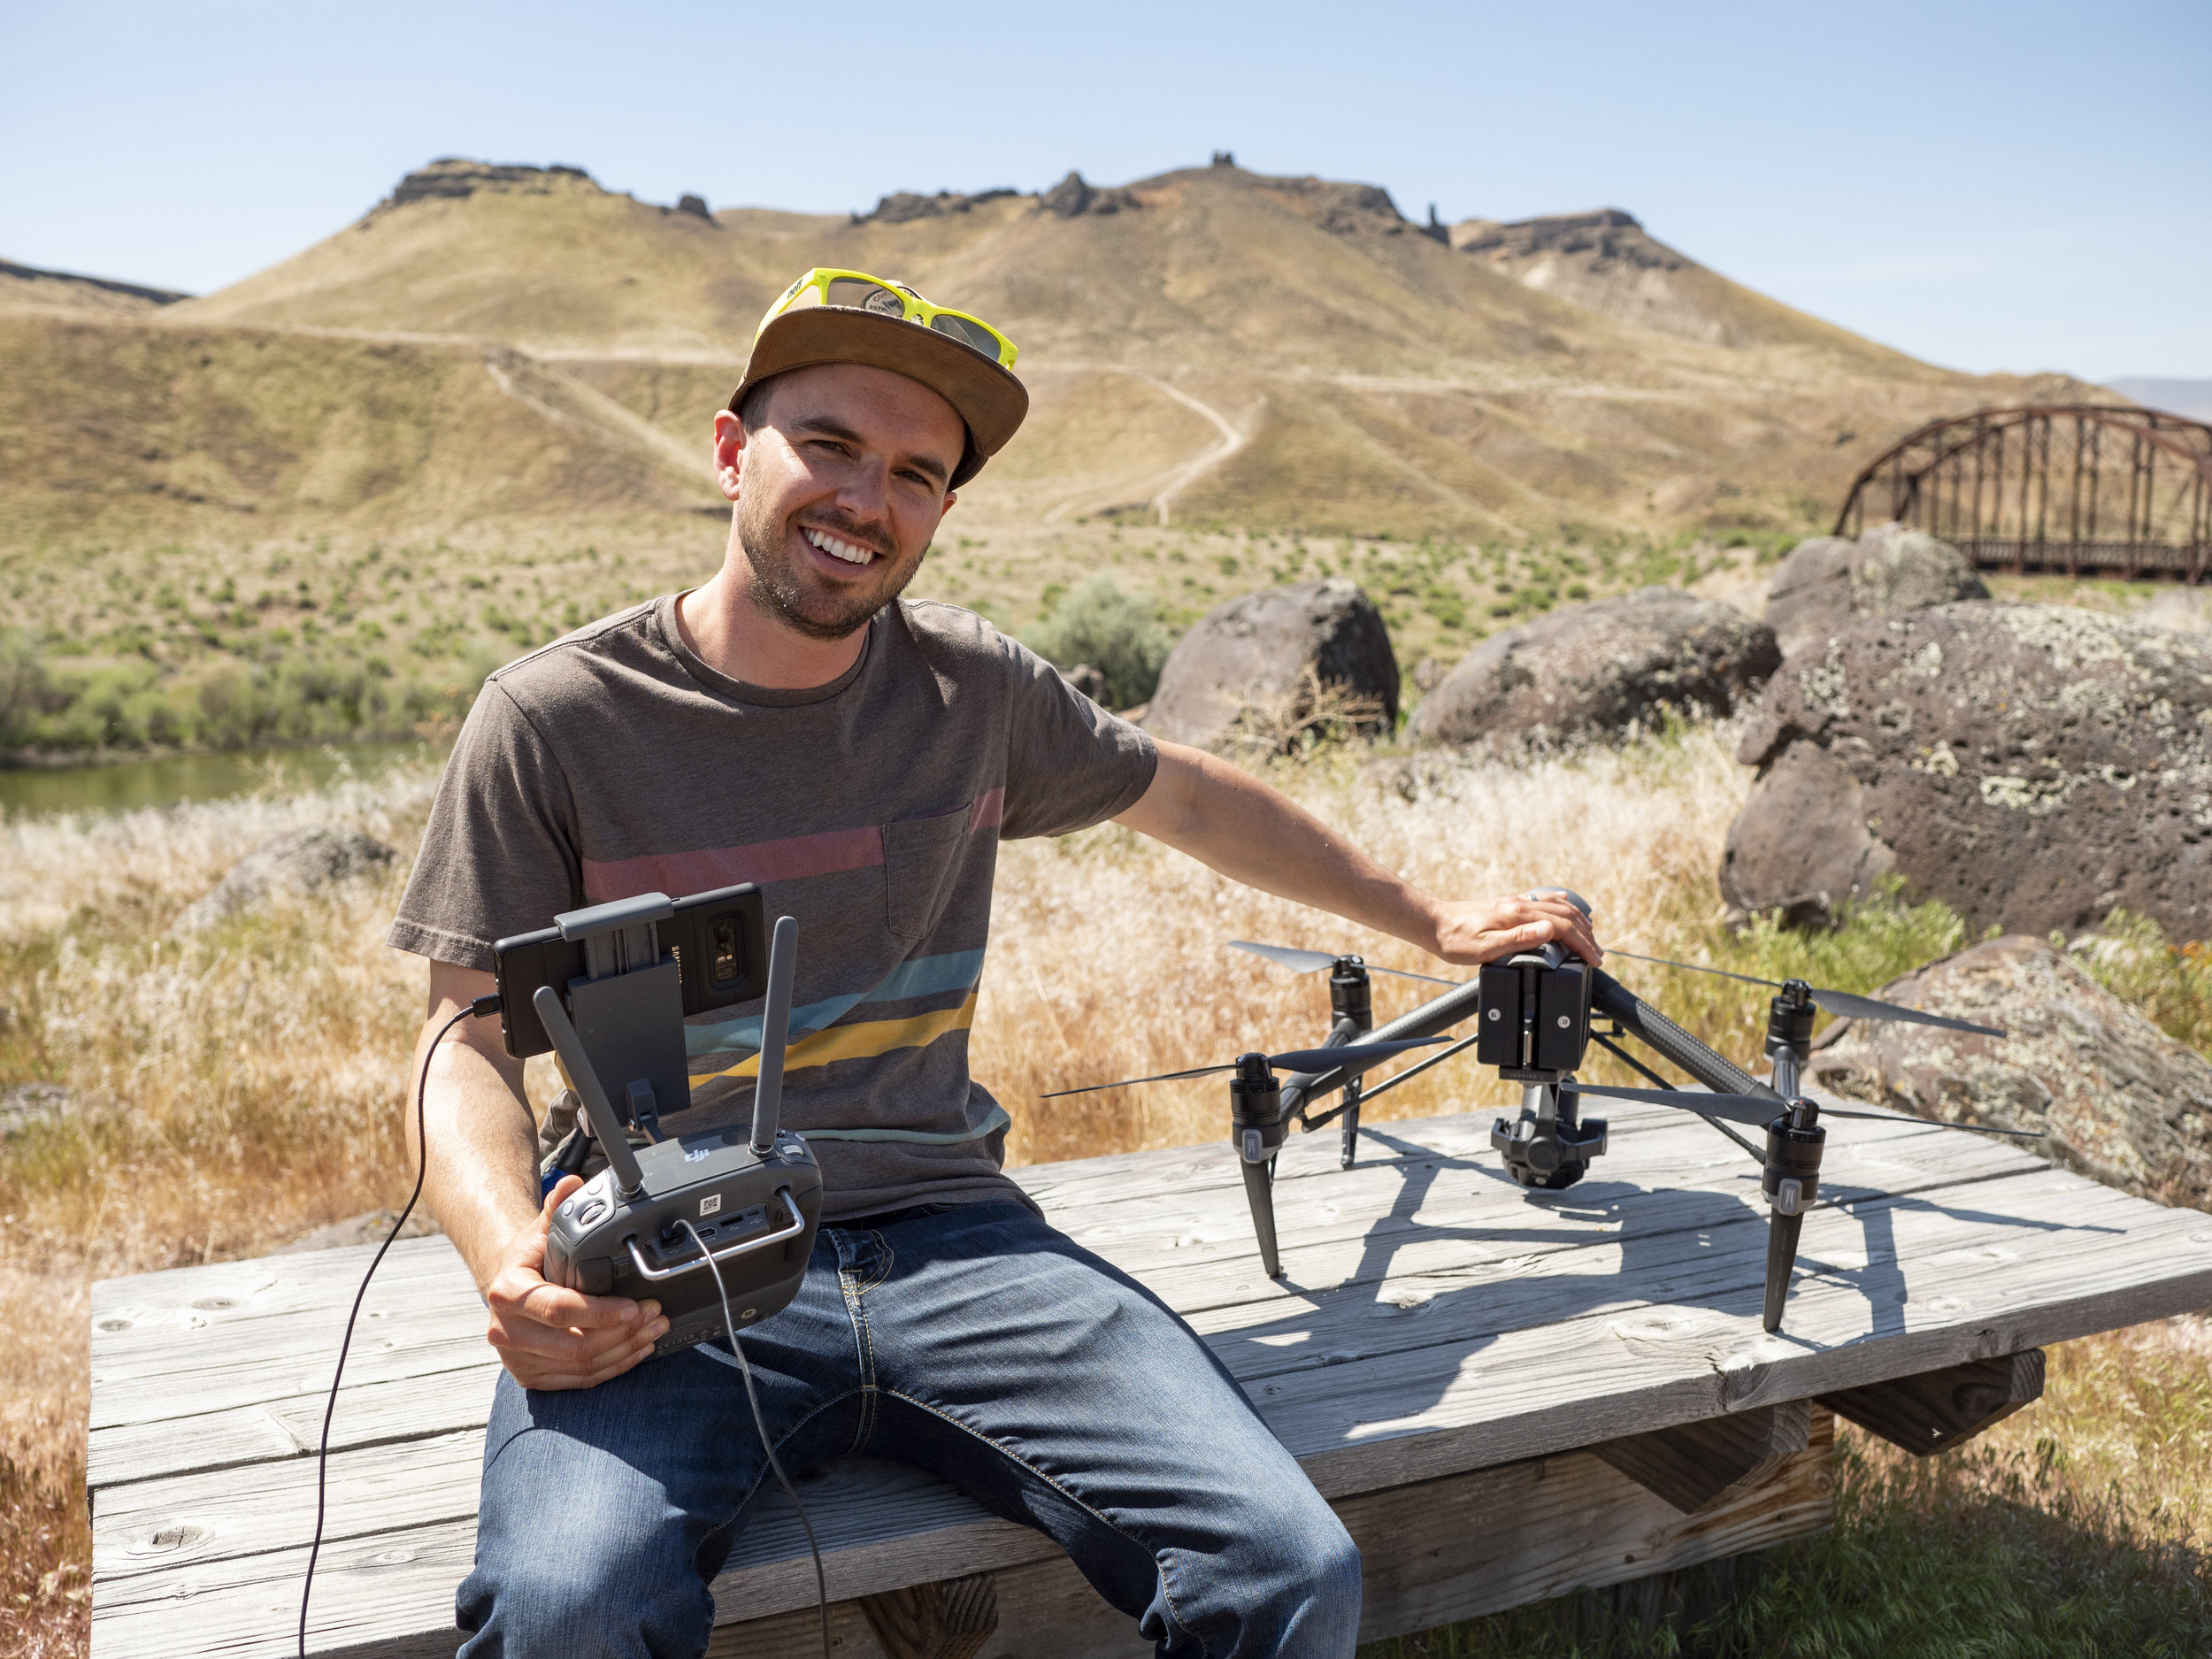 stephen_veals_studios_drone_operator_faa_certified_aerial_cinematographer.JPG